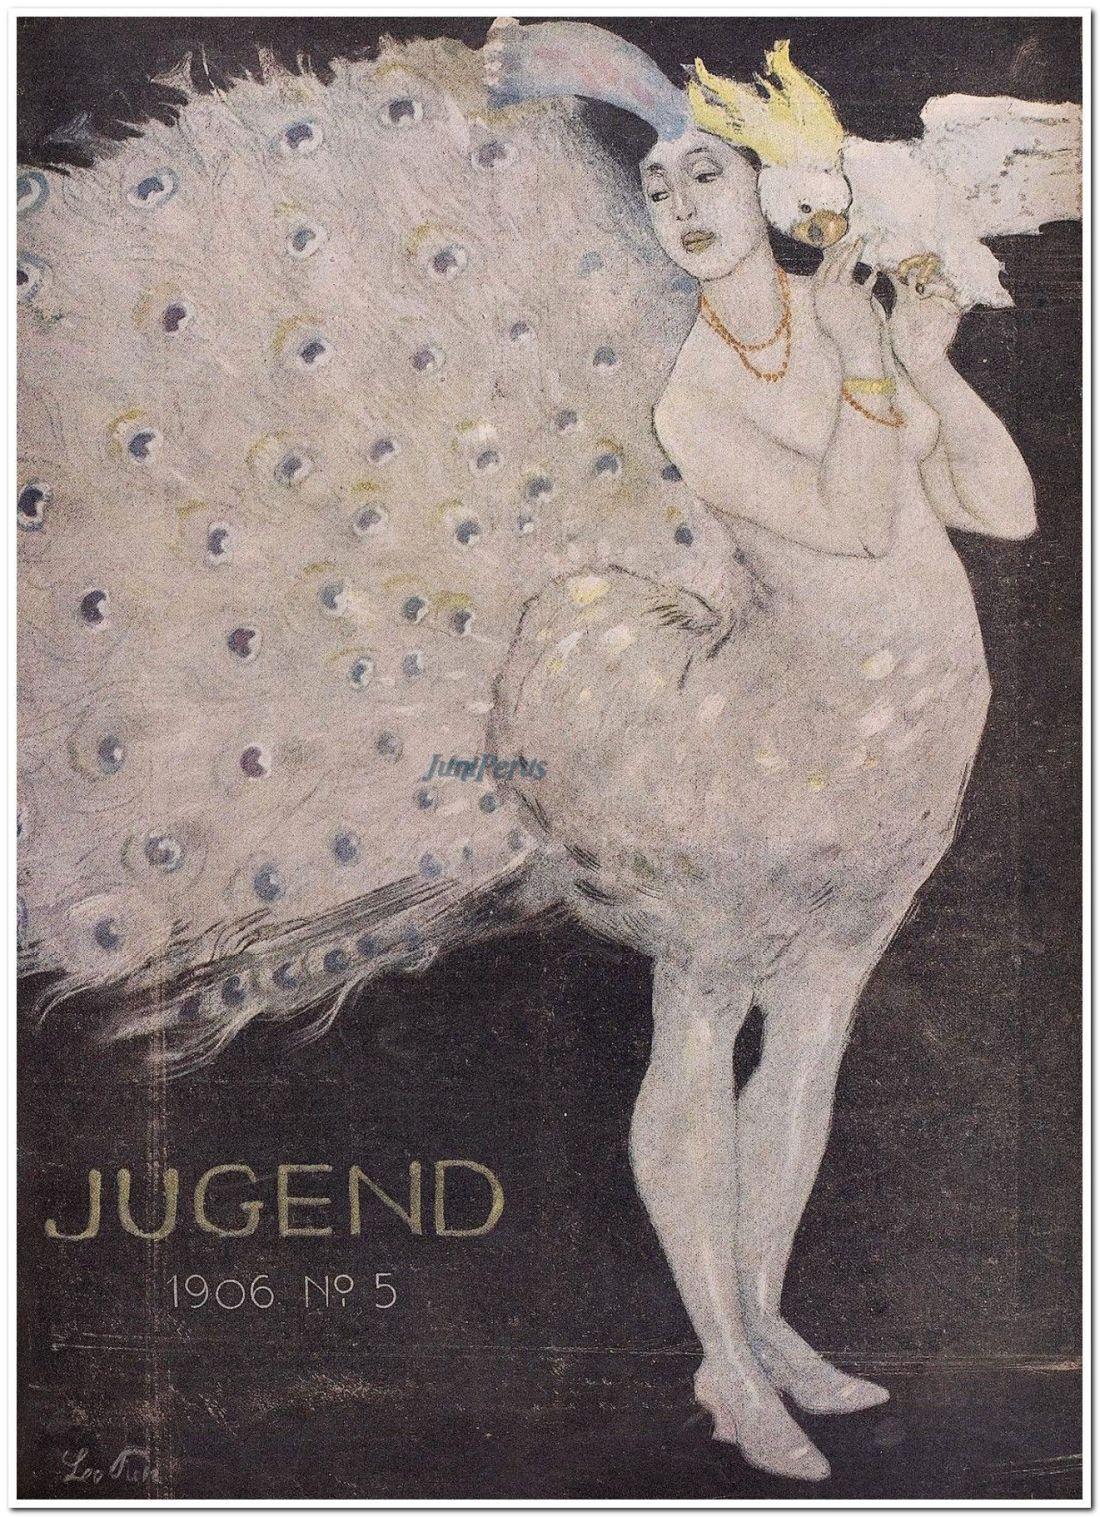 Cover art for Jugend. 1906, Number 5.